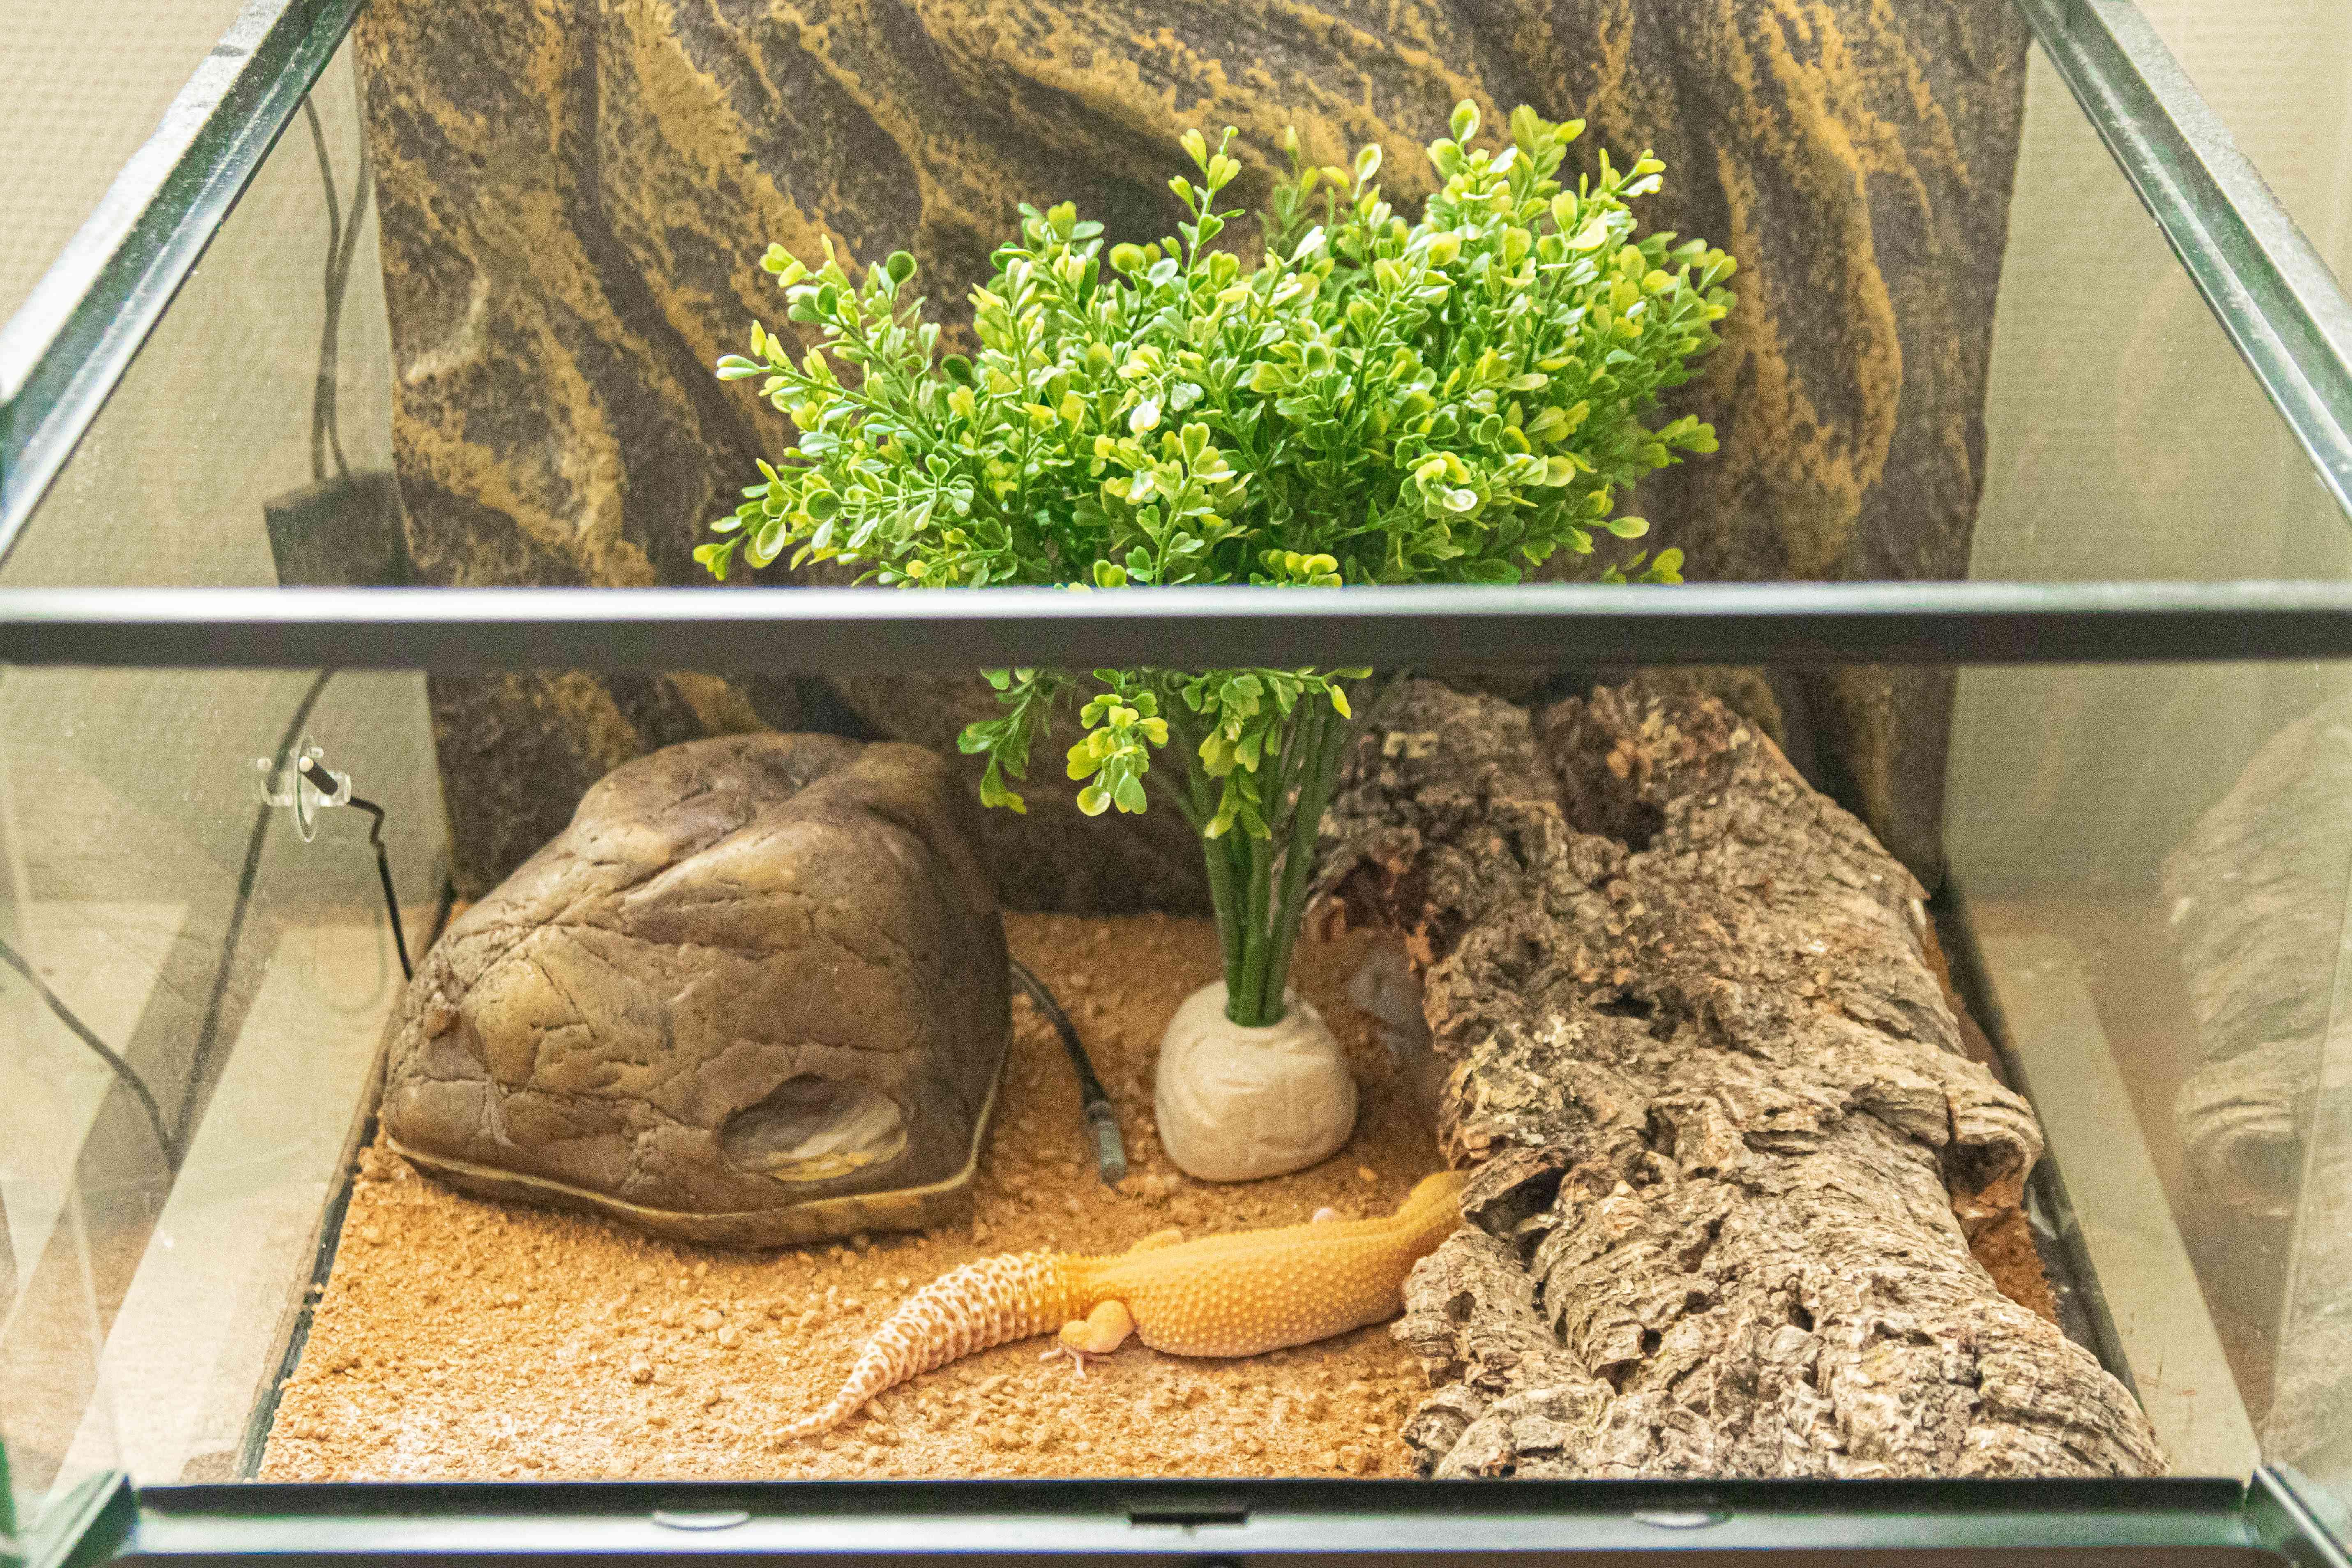 leopard gecko's habitat